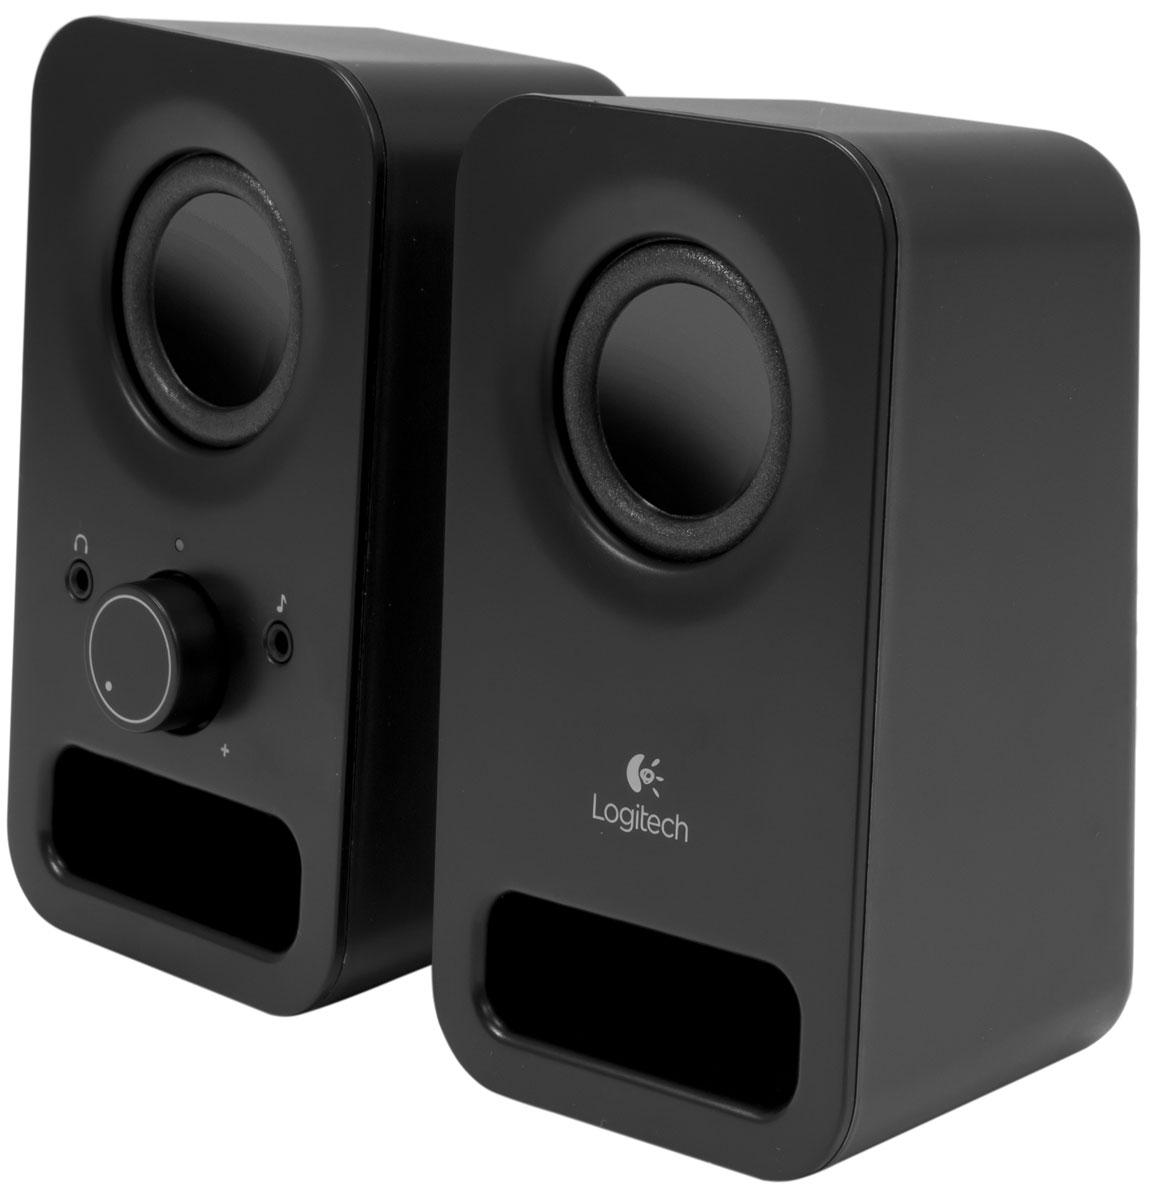 лучшая цена Компьютерная акустика Logitech Z150, Midnight Black (980-000814)